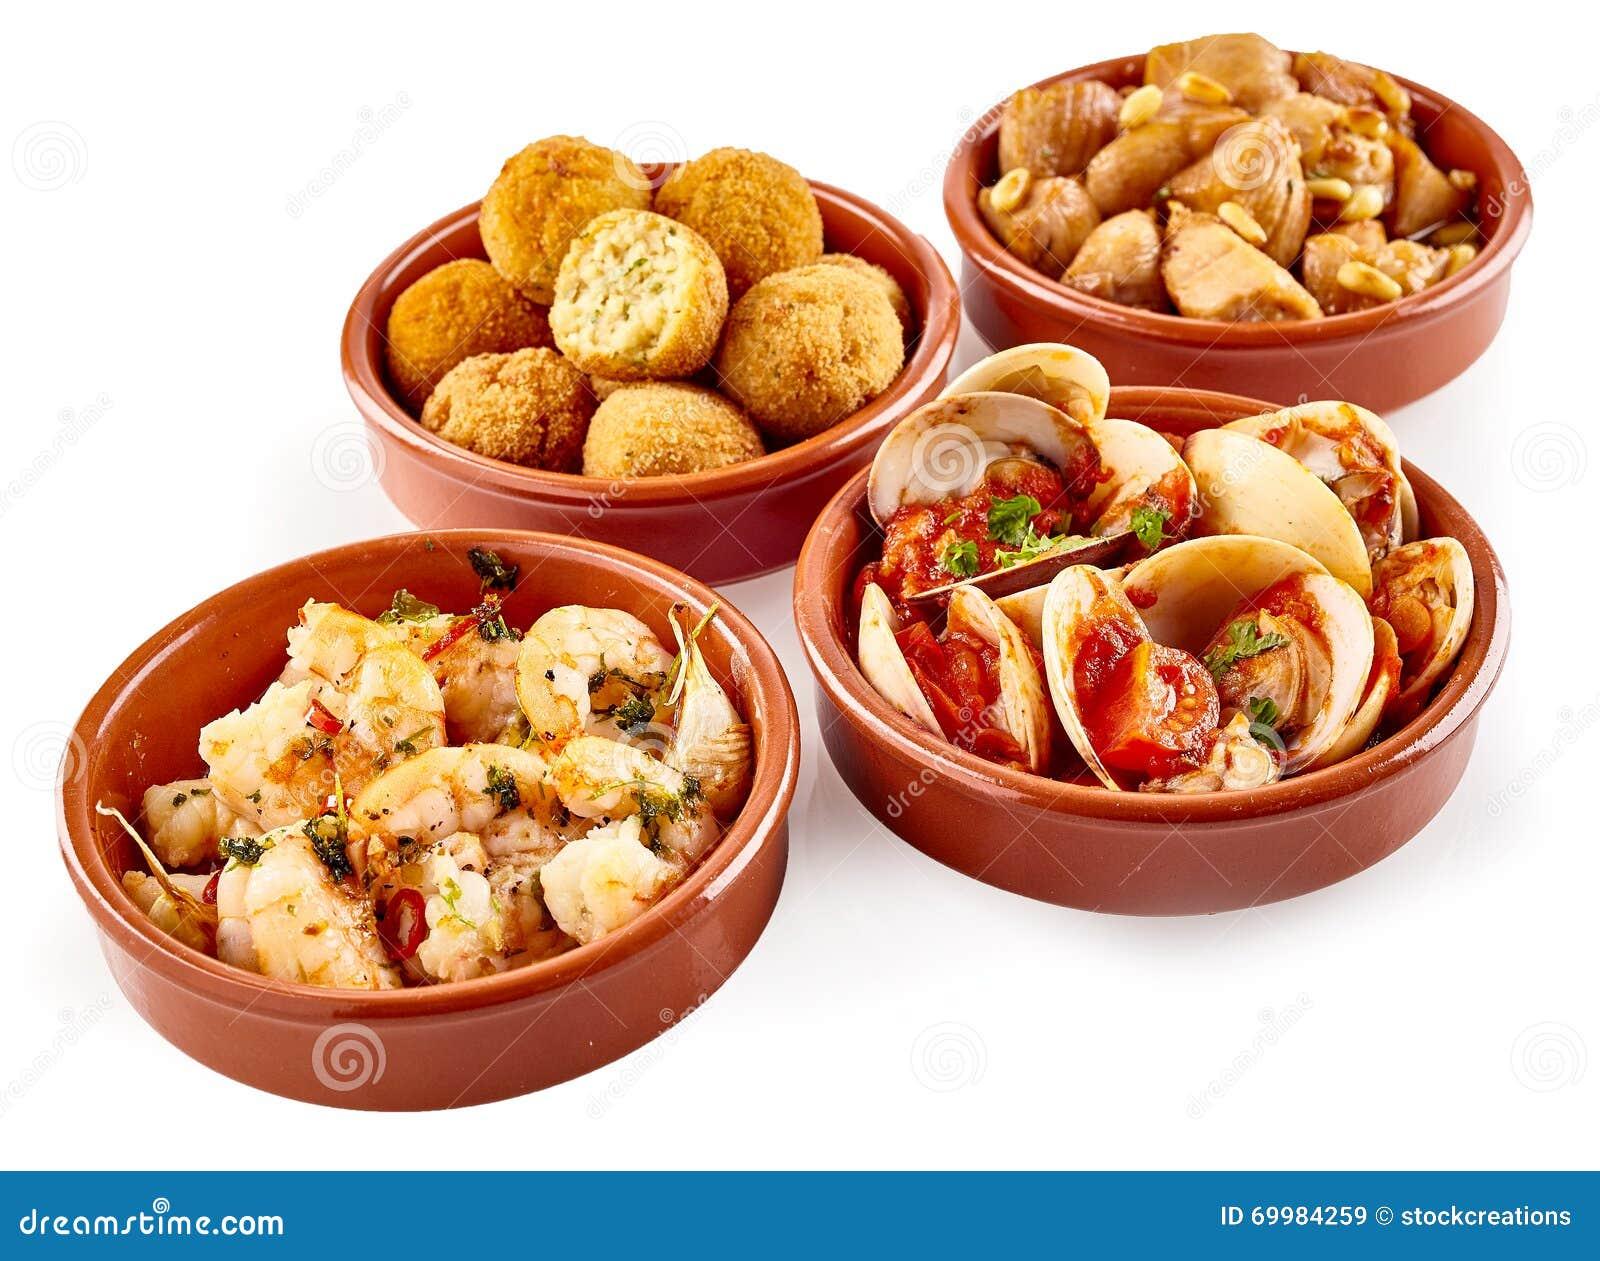 Assorted Traditional Spanish Tapas Snacks Stock Photo - Image ...